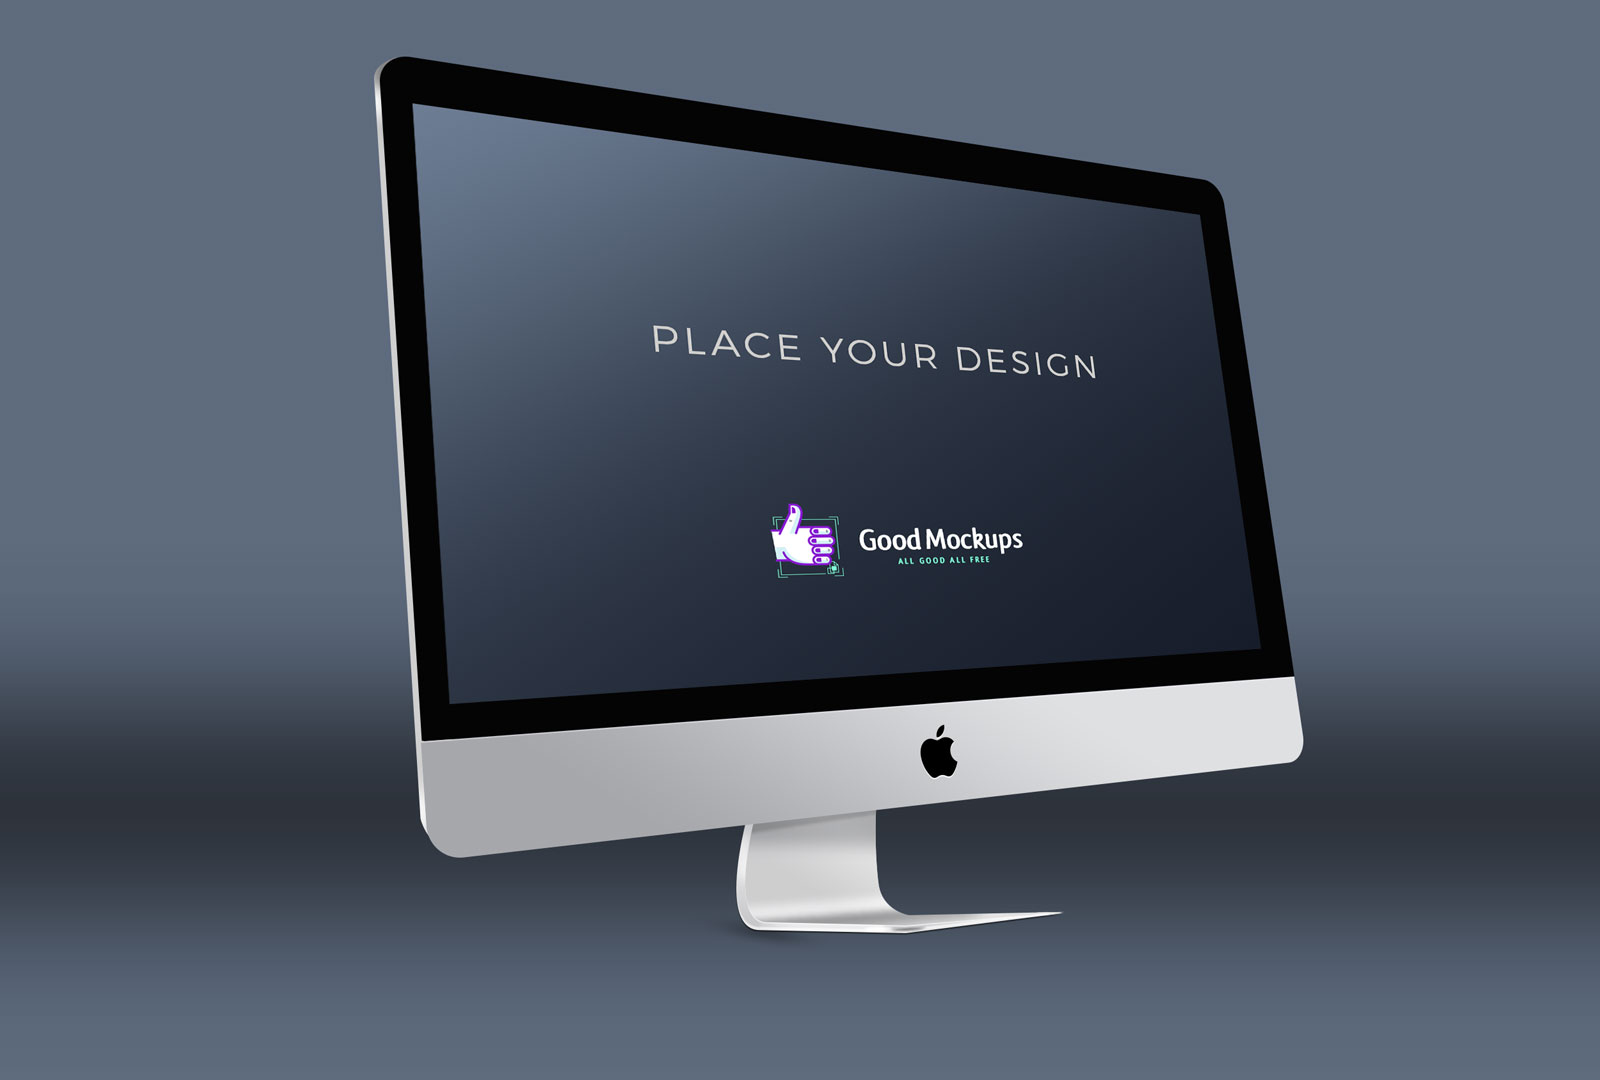 Free-Apple-iMac-Mockup-PSD-Template-2